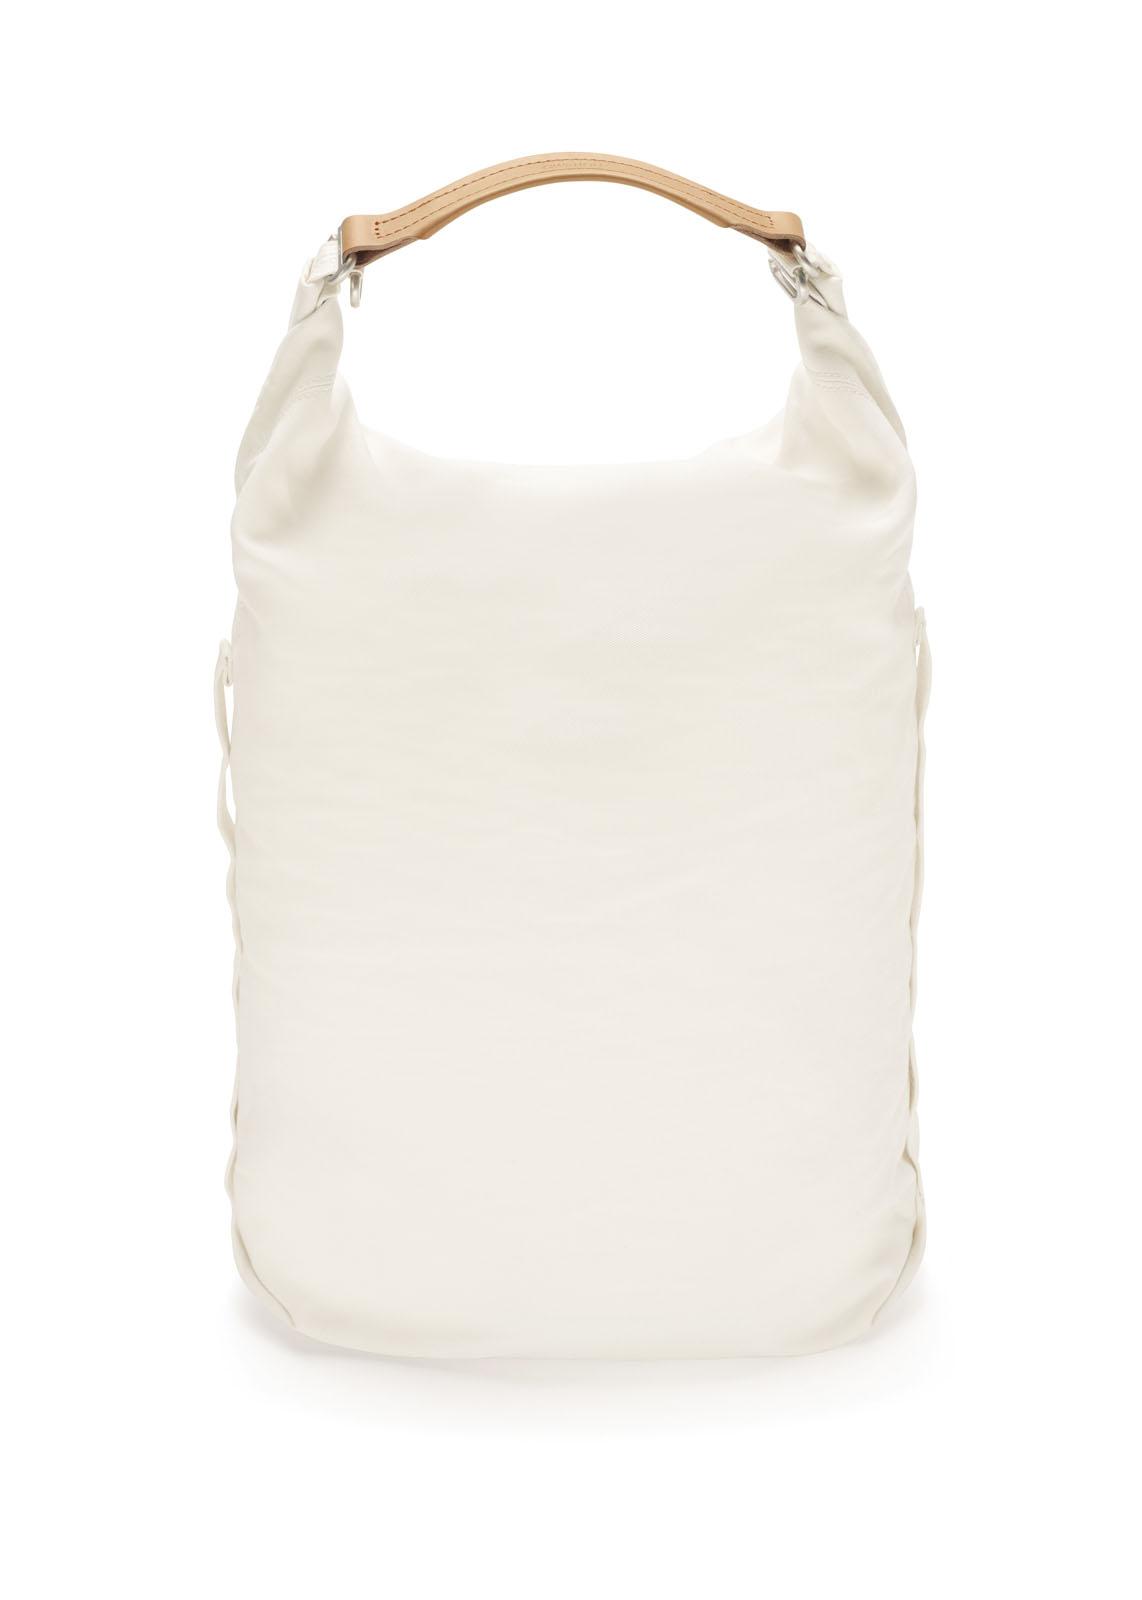 Rücksäcke QwstionNachhaltige Rücksäcke Wertvoll Wertvoll Taschenamp; Rücksäcke QwstionNachhaltige Taschenamp; QwstionNachhaltige Taschenamp; QwstionNachhaltige Wertvoll rshQCtd